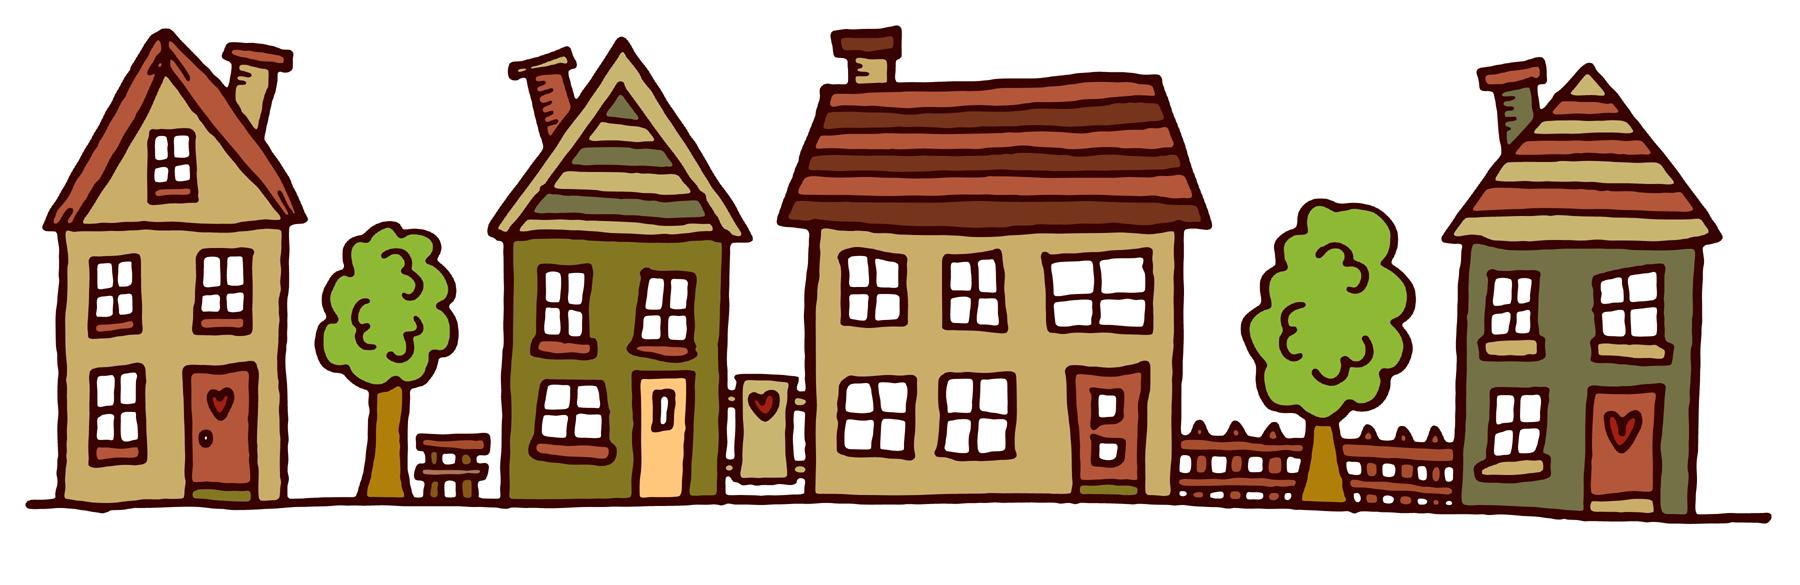 Free street house cliparts. Neighborhood clipart townhouse